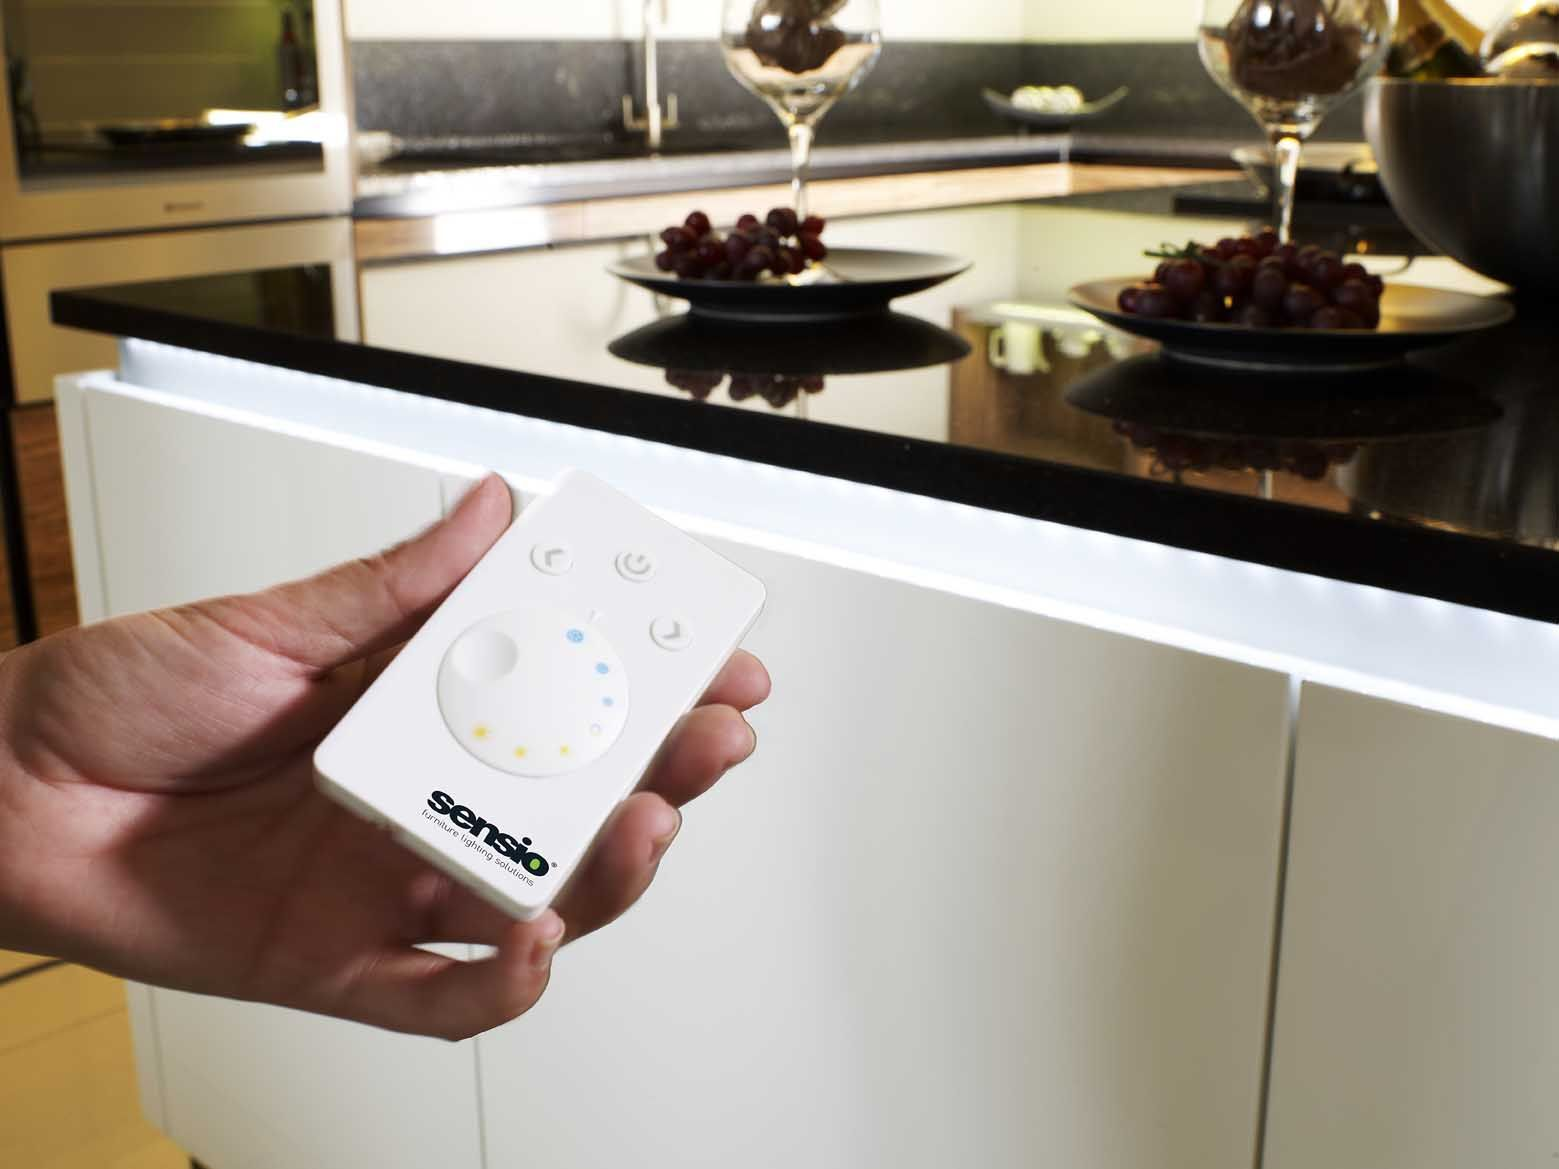 Use flexible strip lighting below the worktop on handless kitchens use flexible strip lighting below the worktop on handless kitchens to create a aloadofball Choice Image